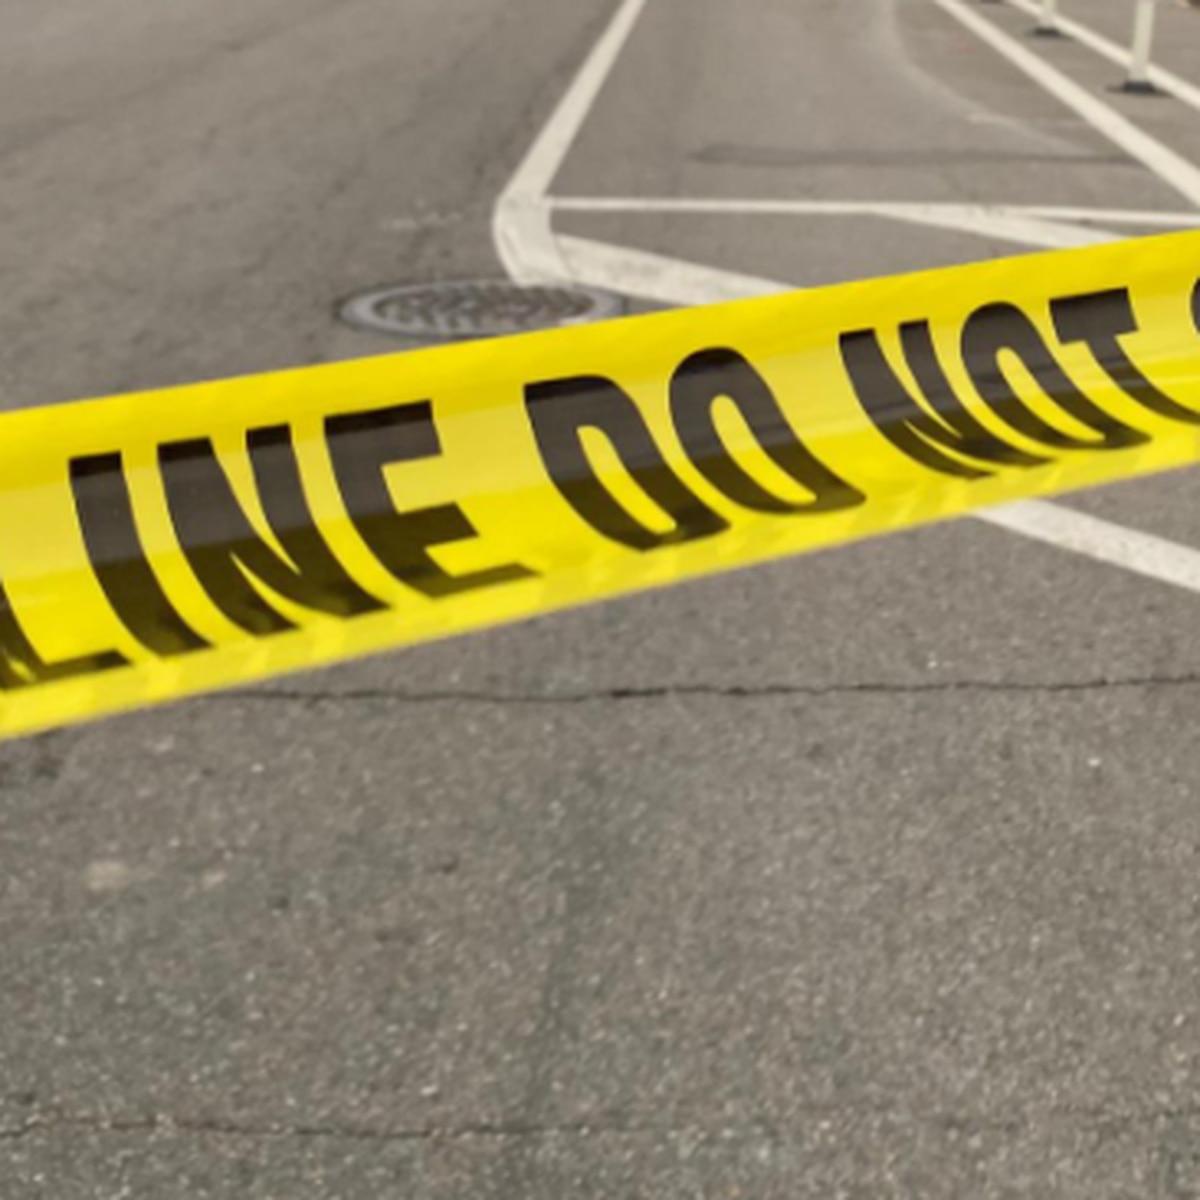 Young Memphis man loses both arms in horrific crash